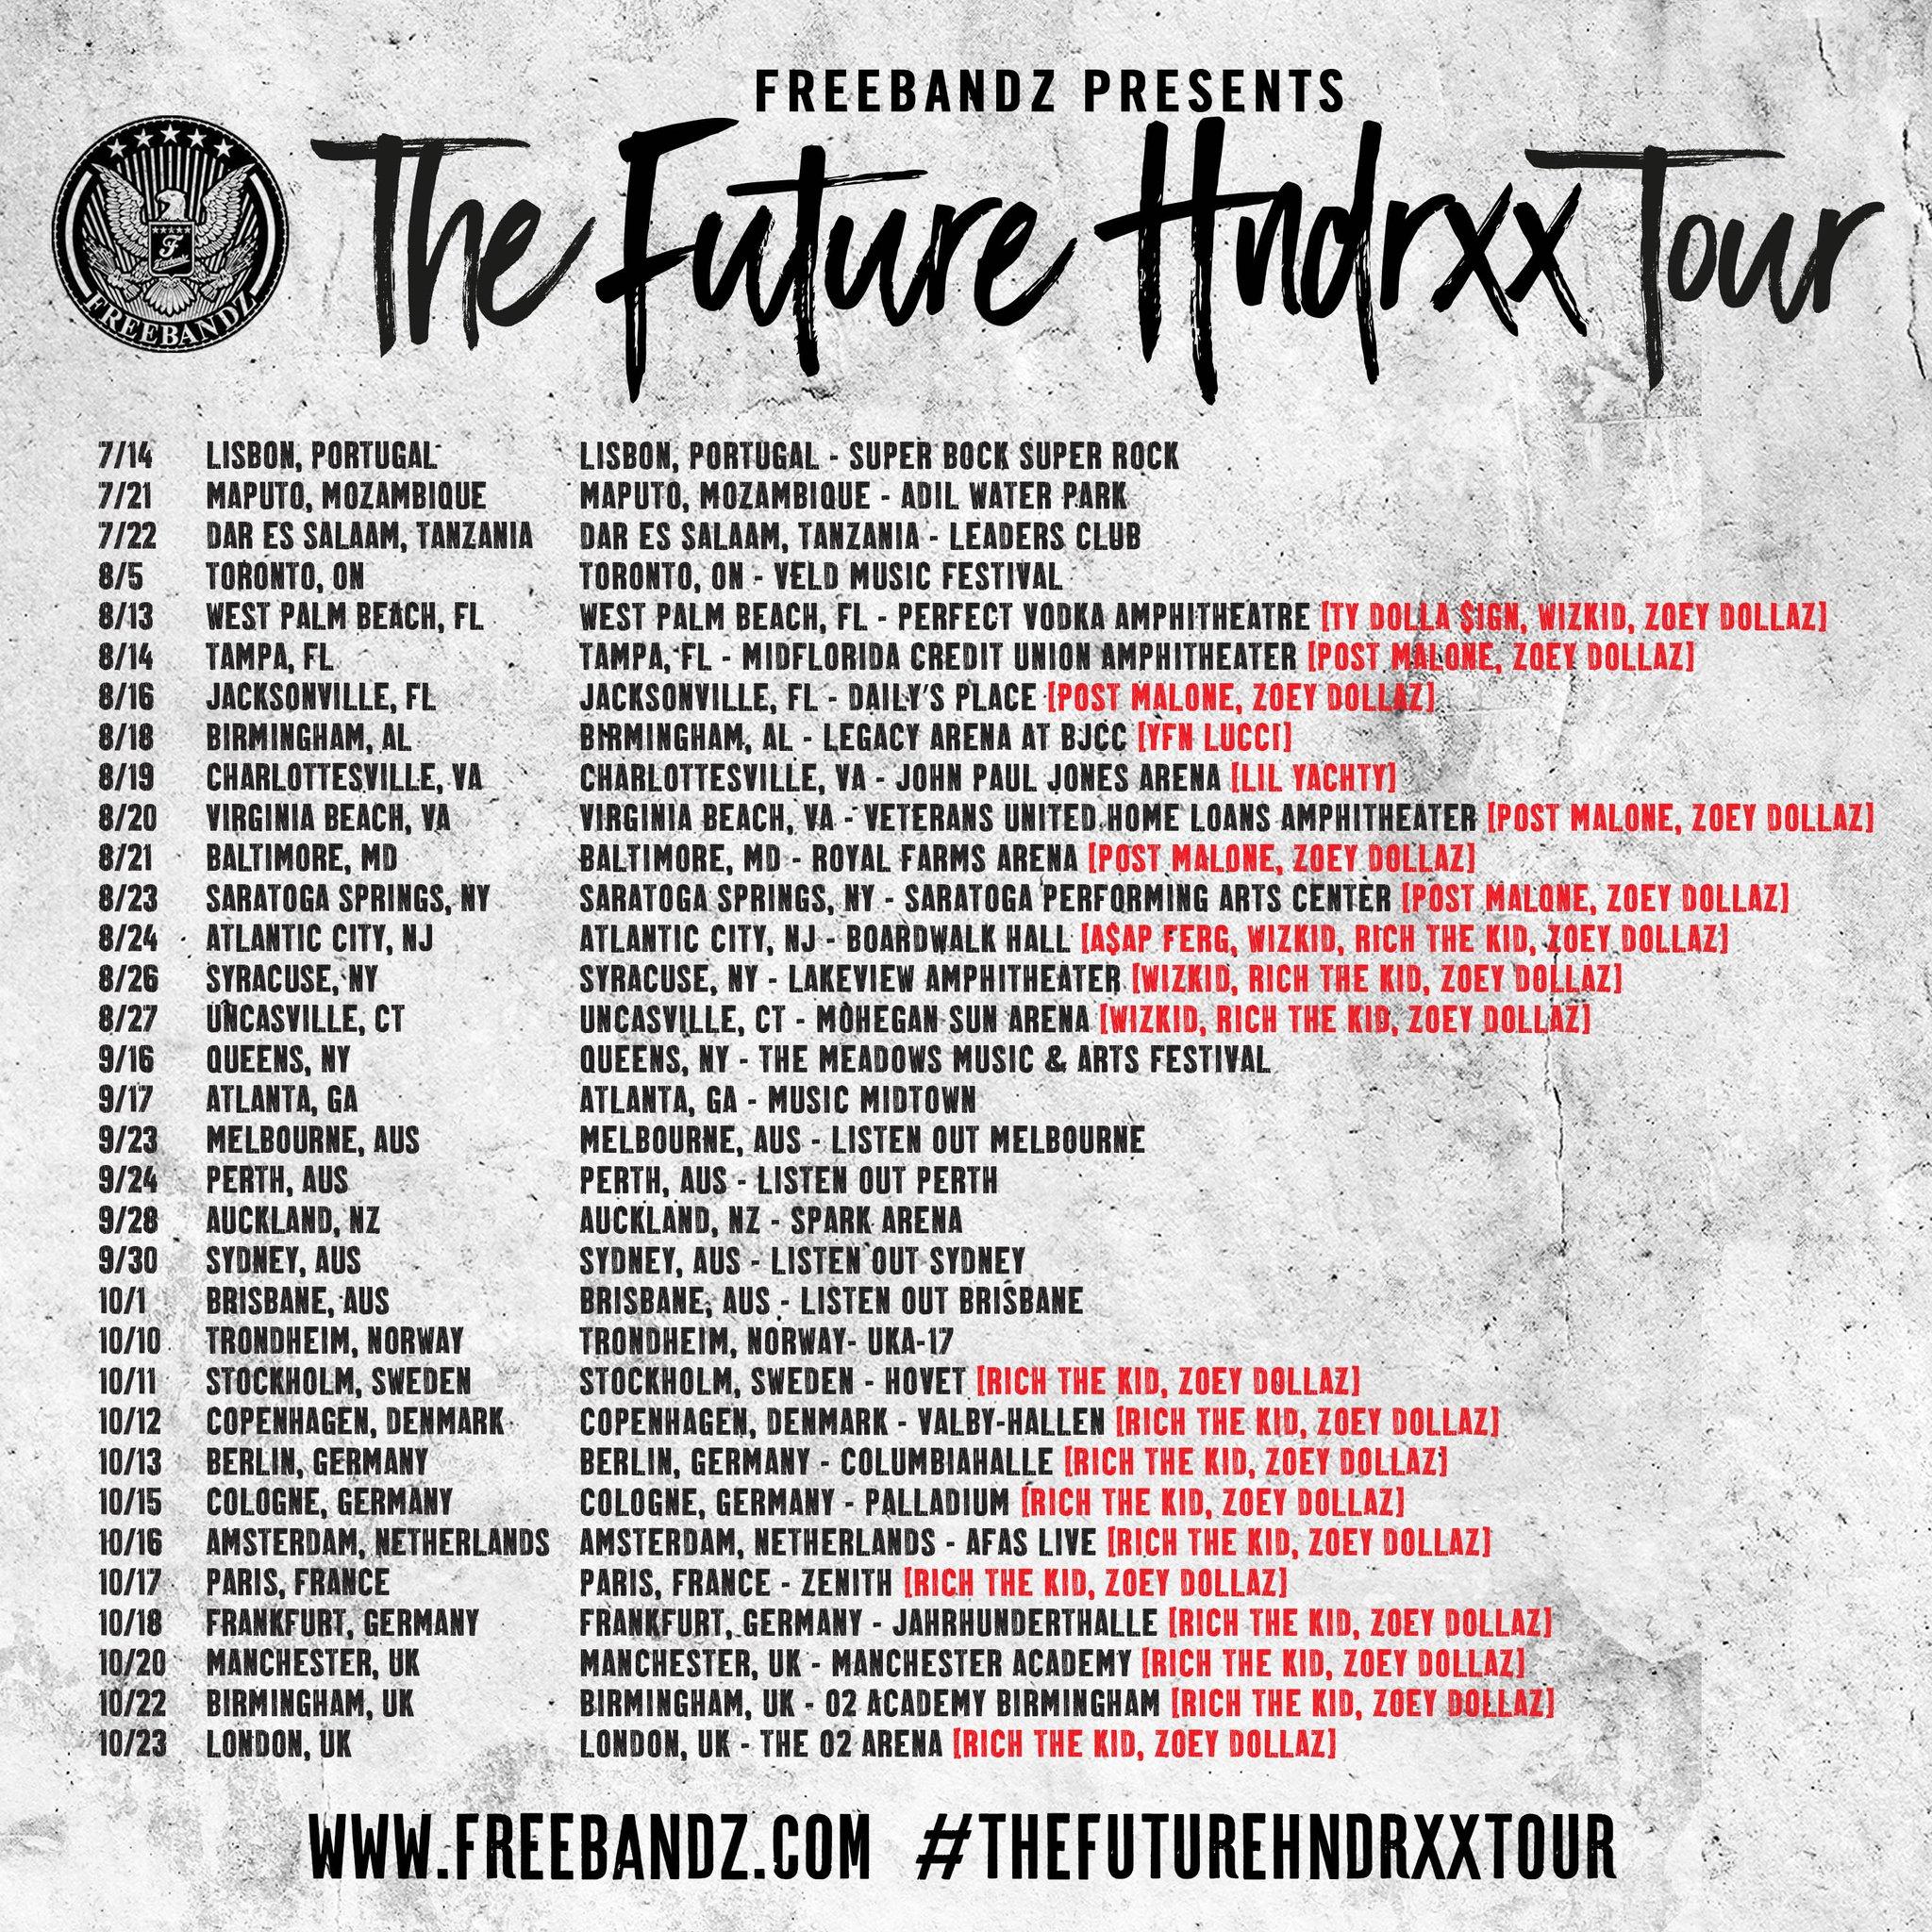 Grab Tix Now! #THEFUTUREHNDRXXTOUR   https://t.co/RJmTJuMev8 https://t.co/4ld6Z0U1dl